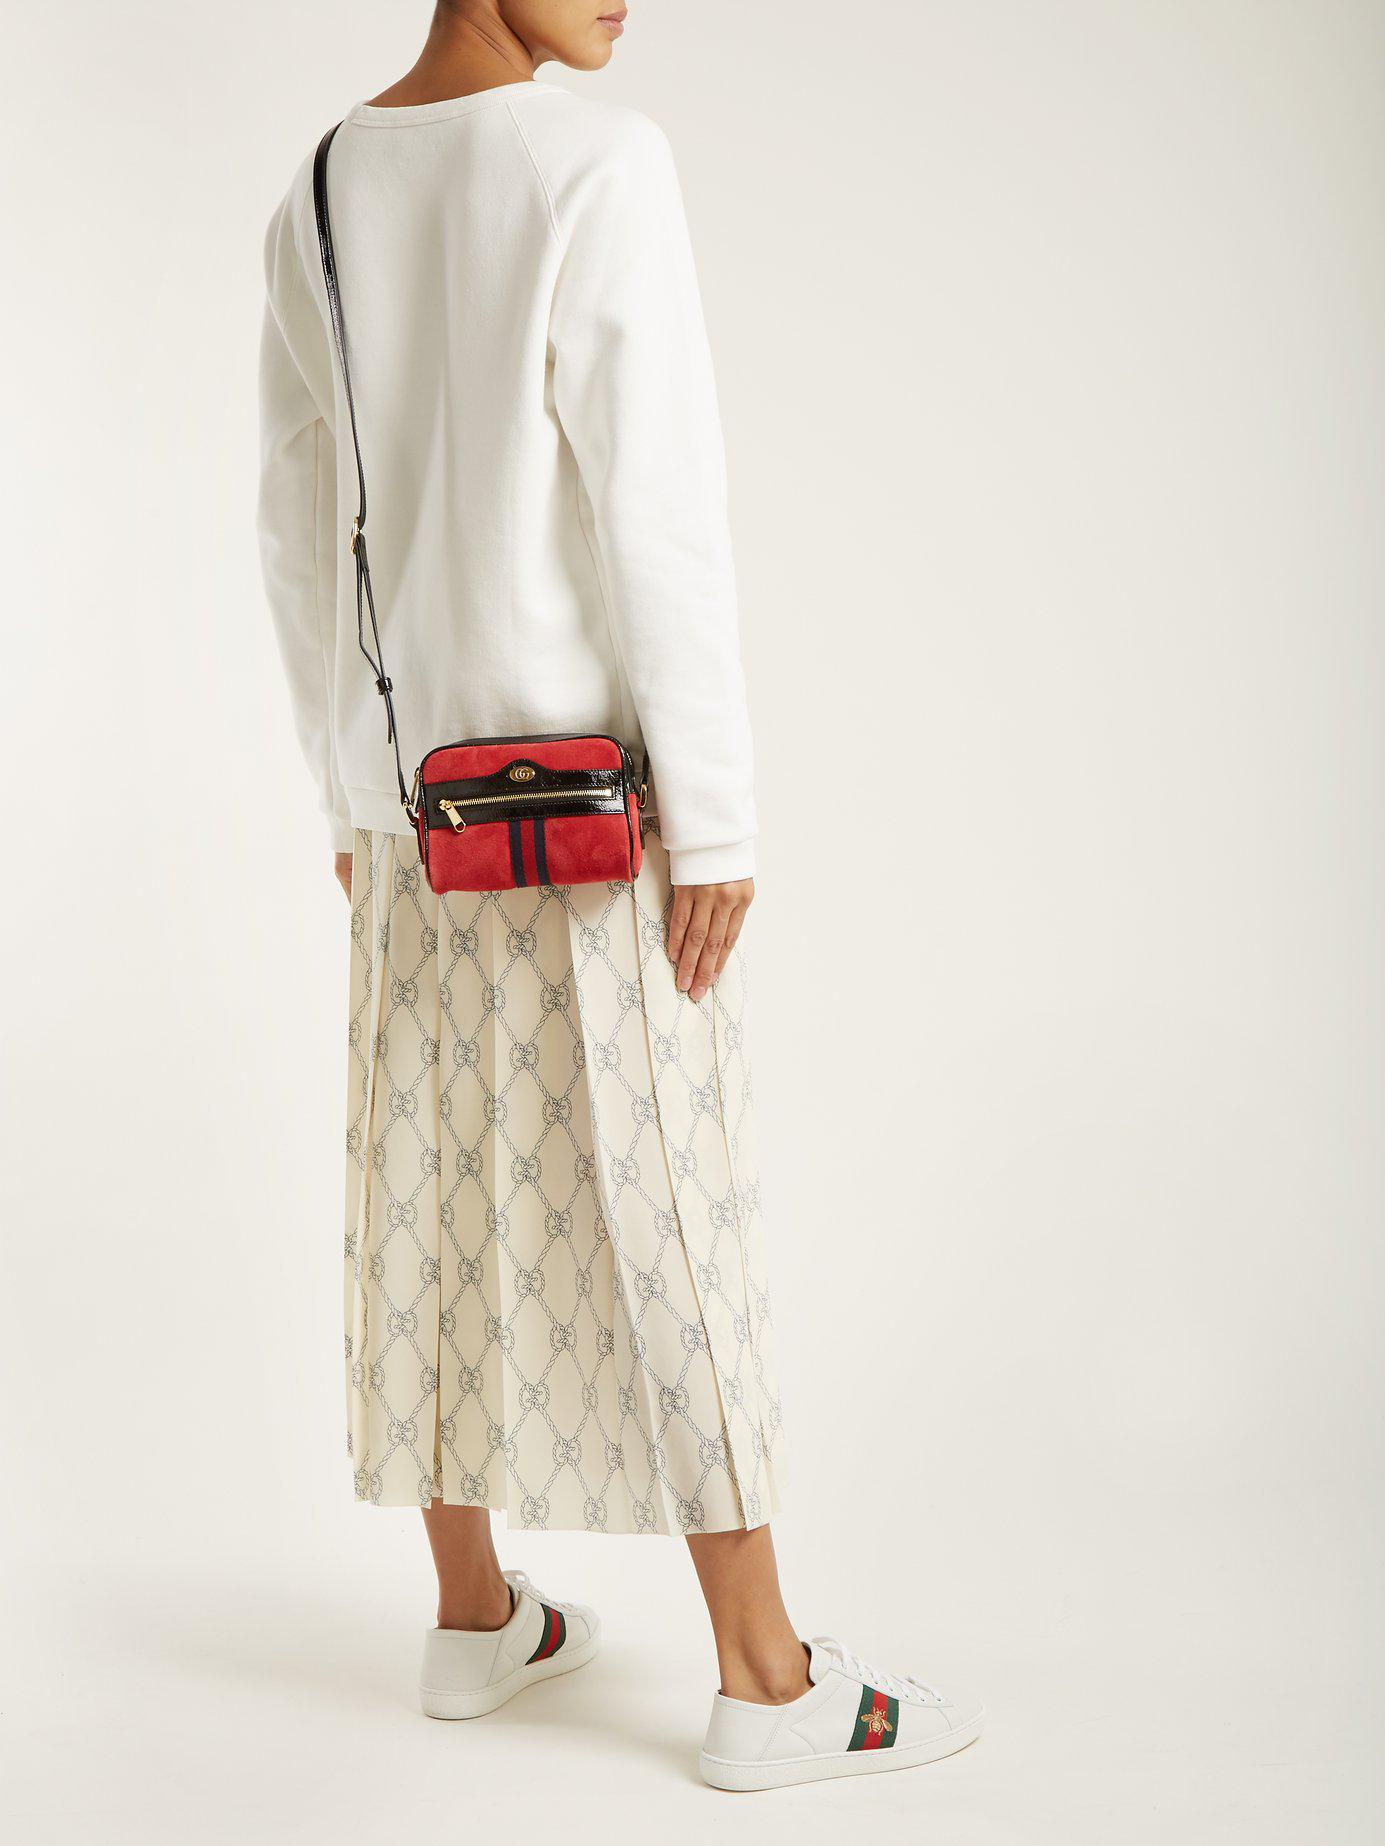 92c3cad9ff7 Gucci - Red Ophidia Mini Suede Cross Body Bag - Lyst. View fullscreen